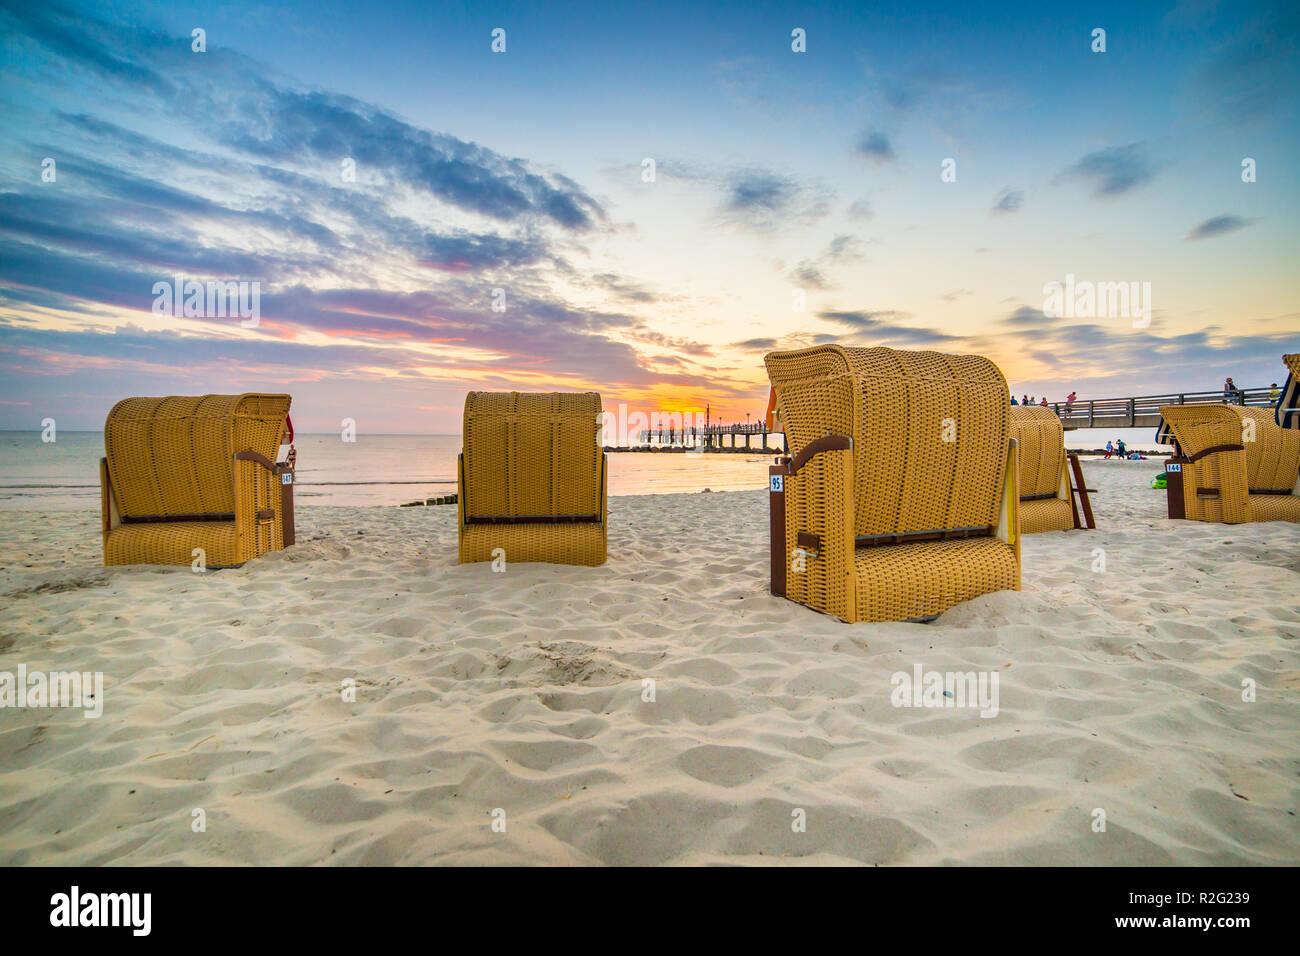 Baltic Sea - Germany - Stock Image